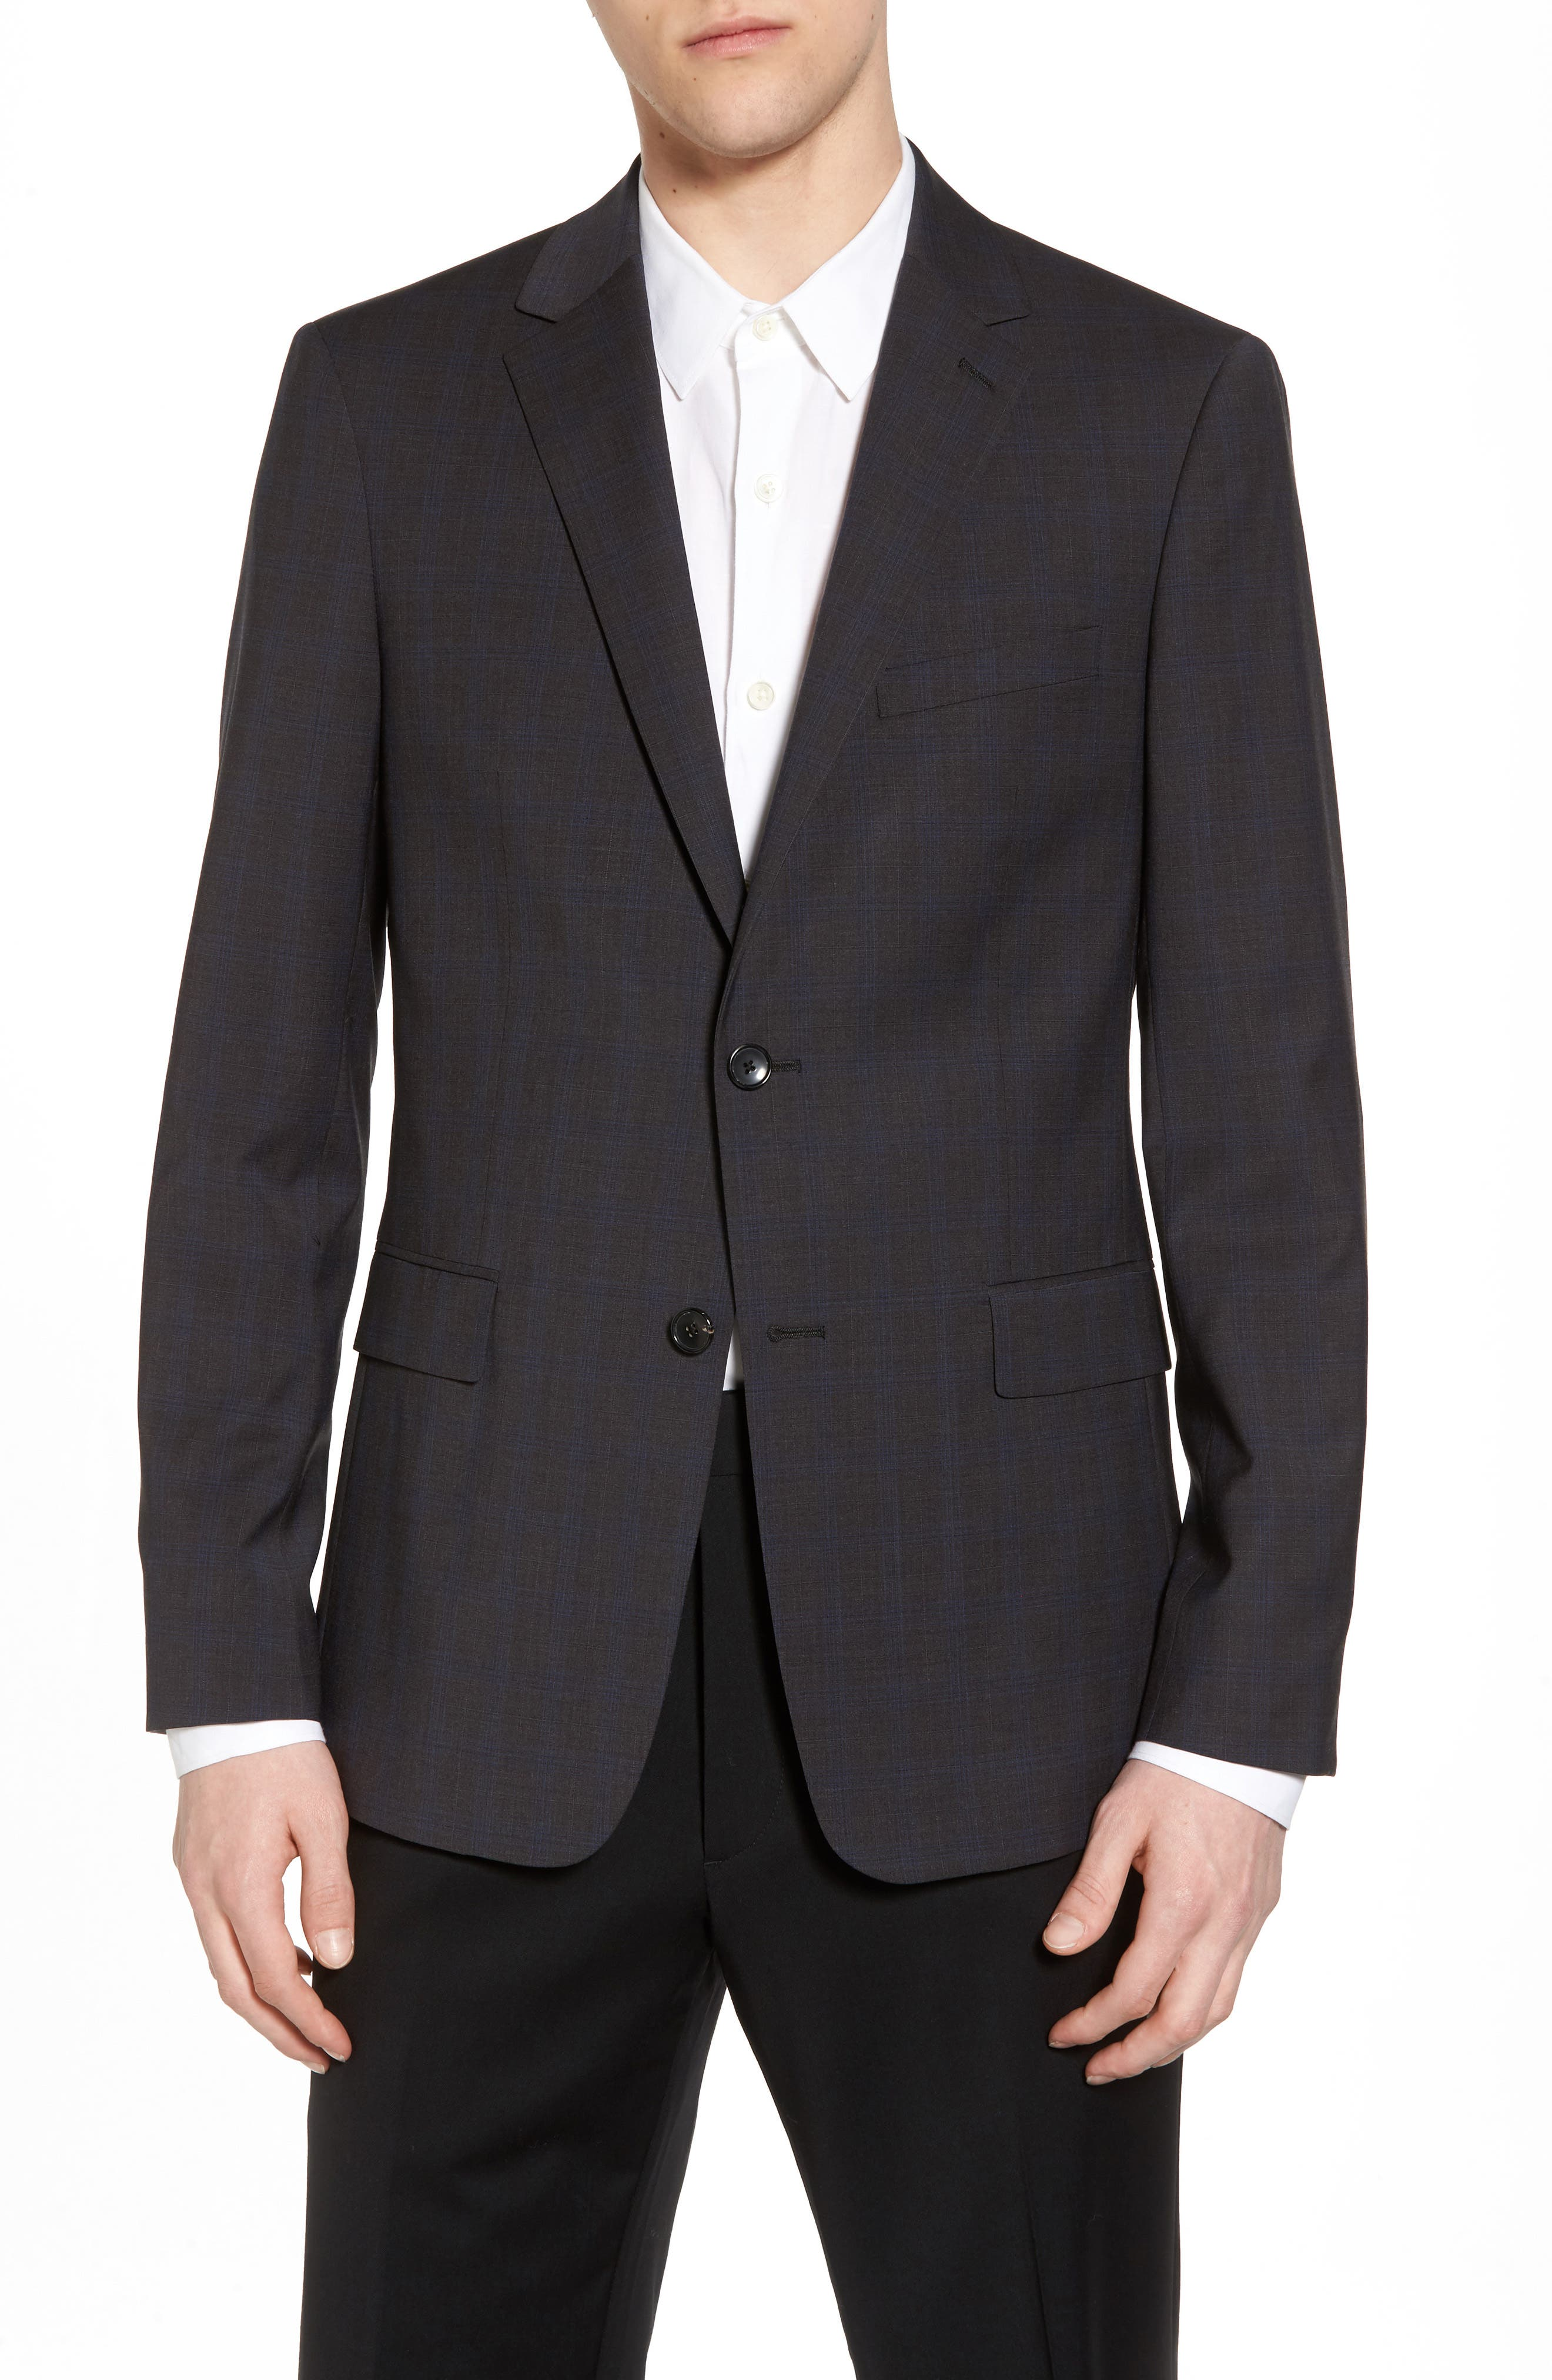 Wellar Grey Blue Plaid Sport Coat,                             Main thumbnail 1, color,                             Grey